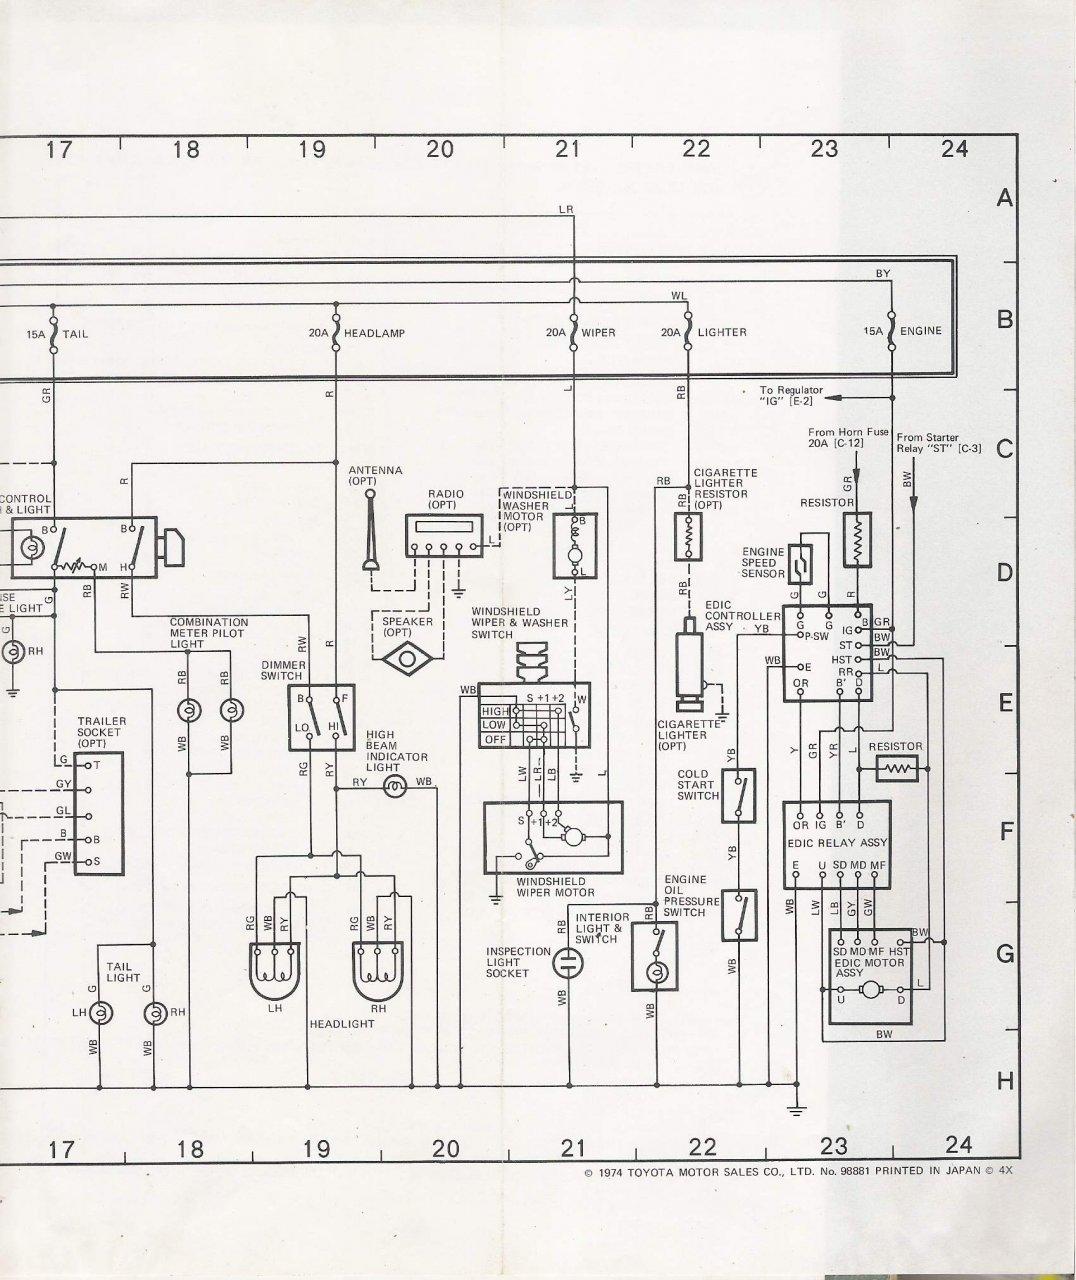 where can i find a wiring schematic for a bj40 diesel ih8mud forum rh forum ih8mud com toyota bj40 wiring diagram